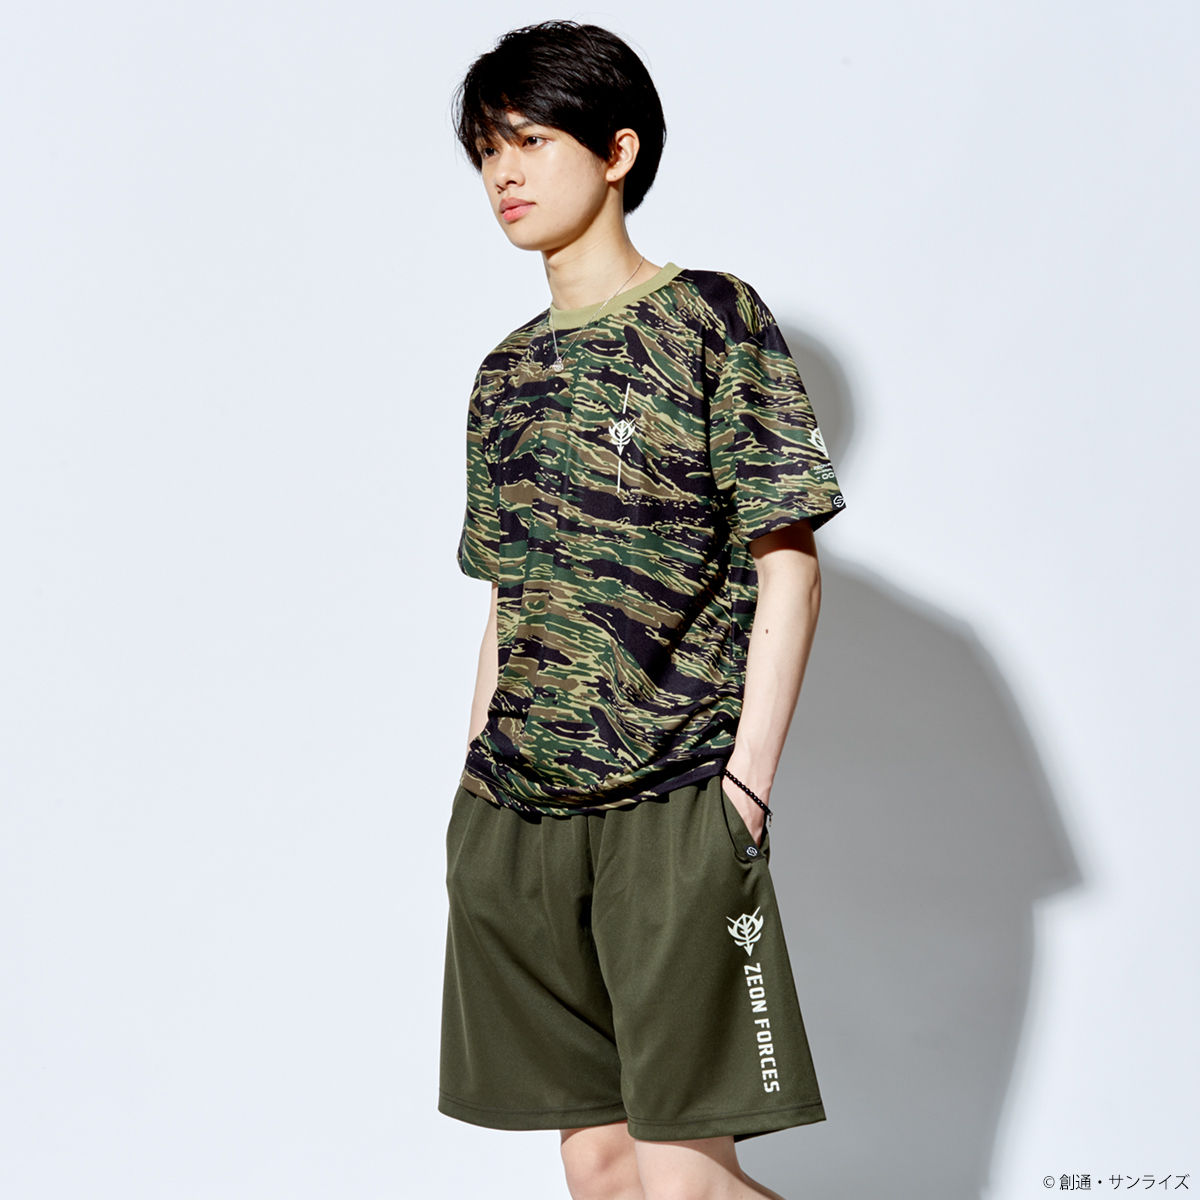 Zeon Camo Shirt—Mobile Suit Gundam/STRICT-G Collaboration